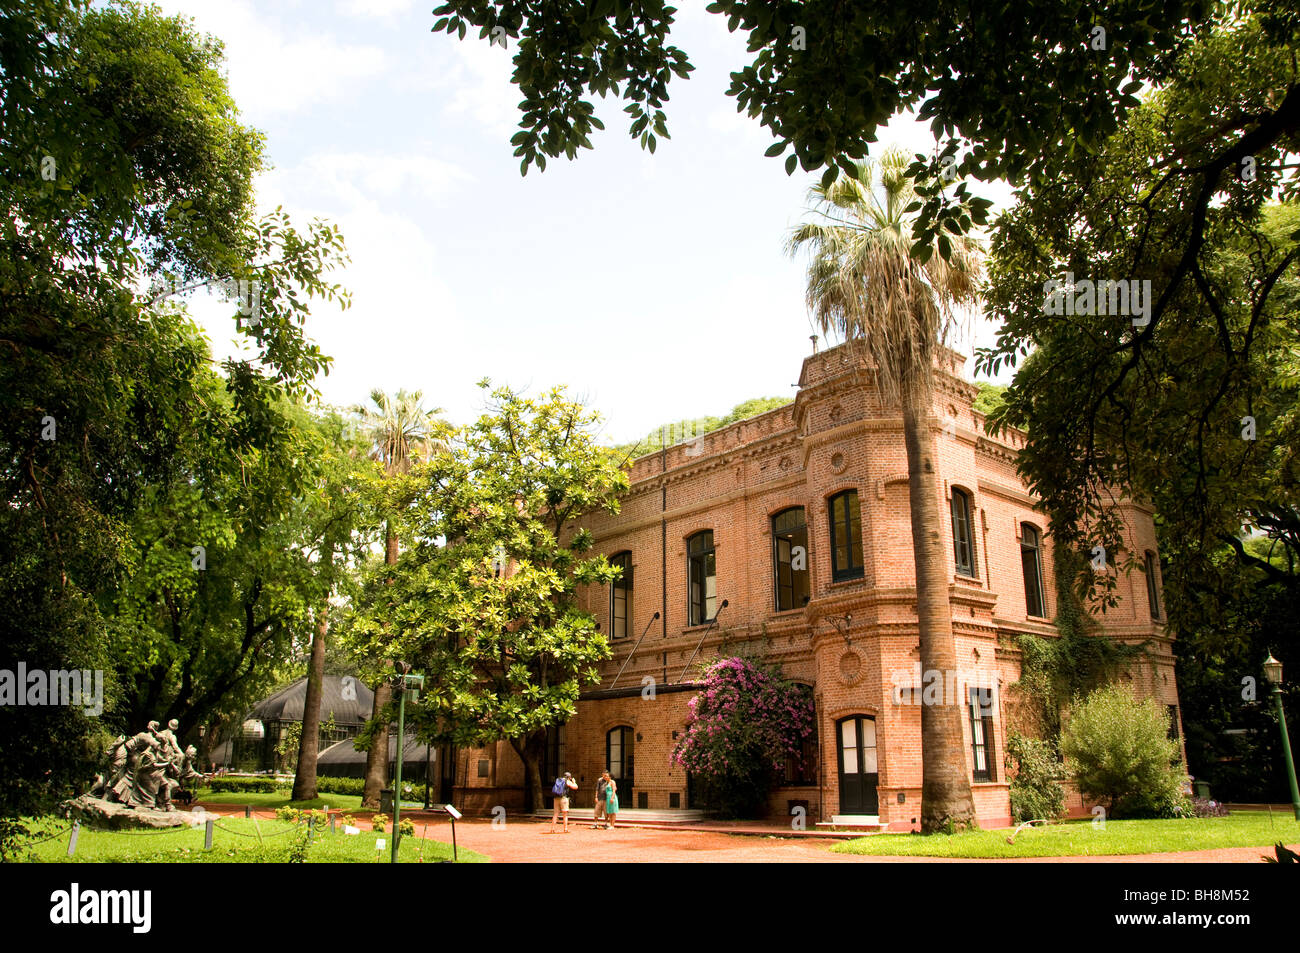 Buenos Aires Argentina Jardin Botanico Botanical Gardens Charles Thays - Stock Image